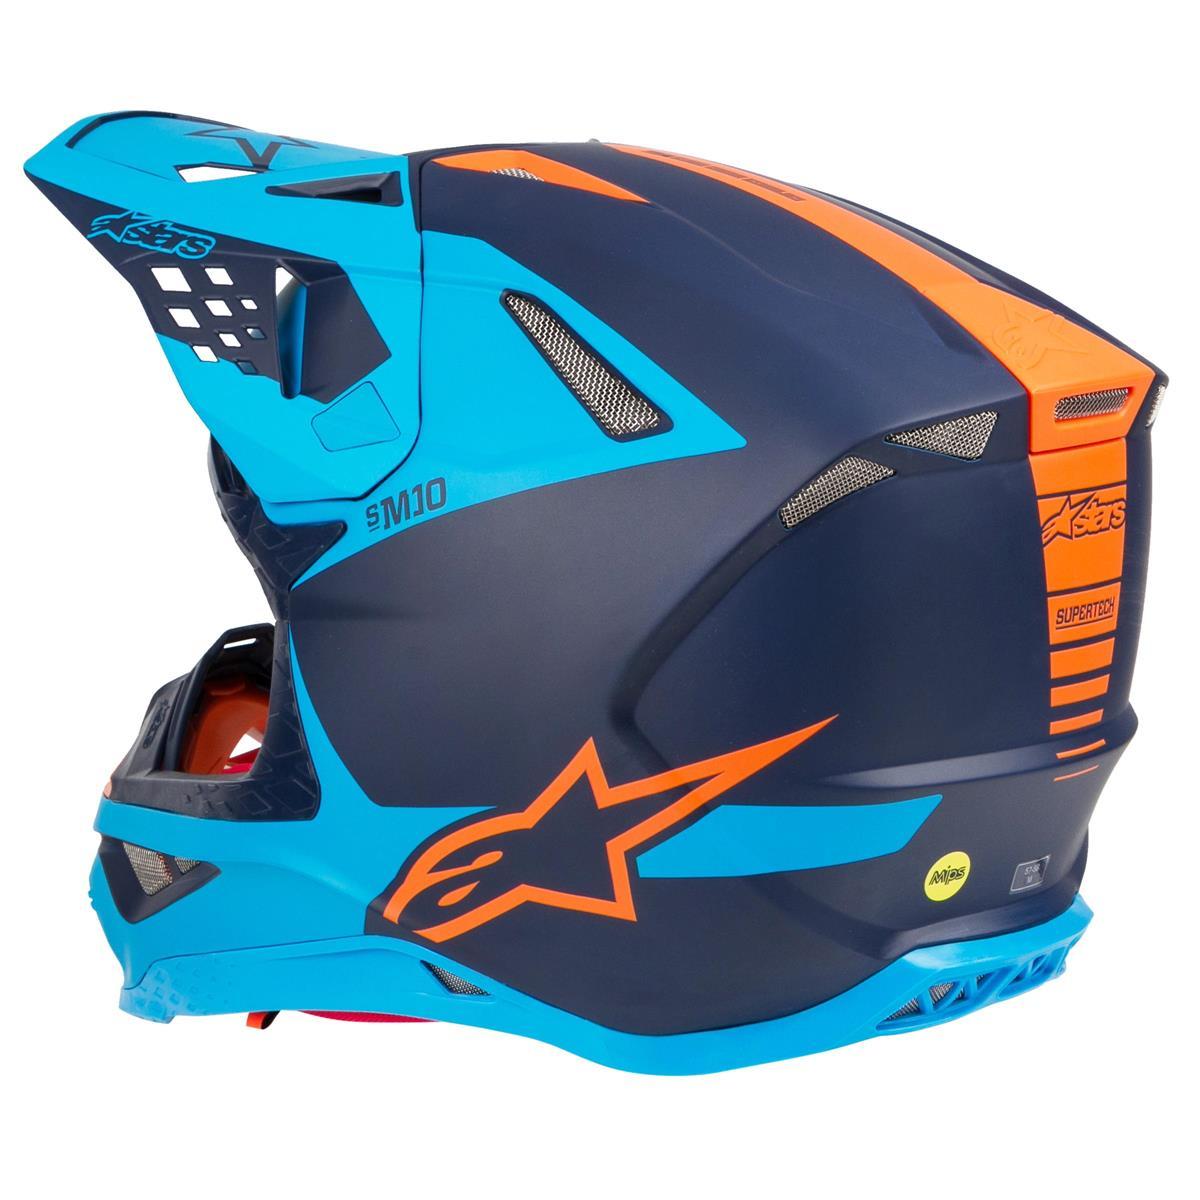 alpinestars-helm-helmet-supertech-s-m10-5 (1)